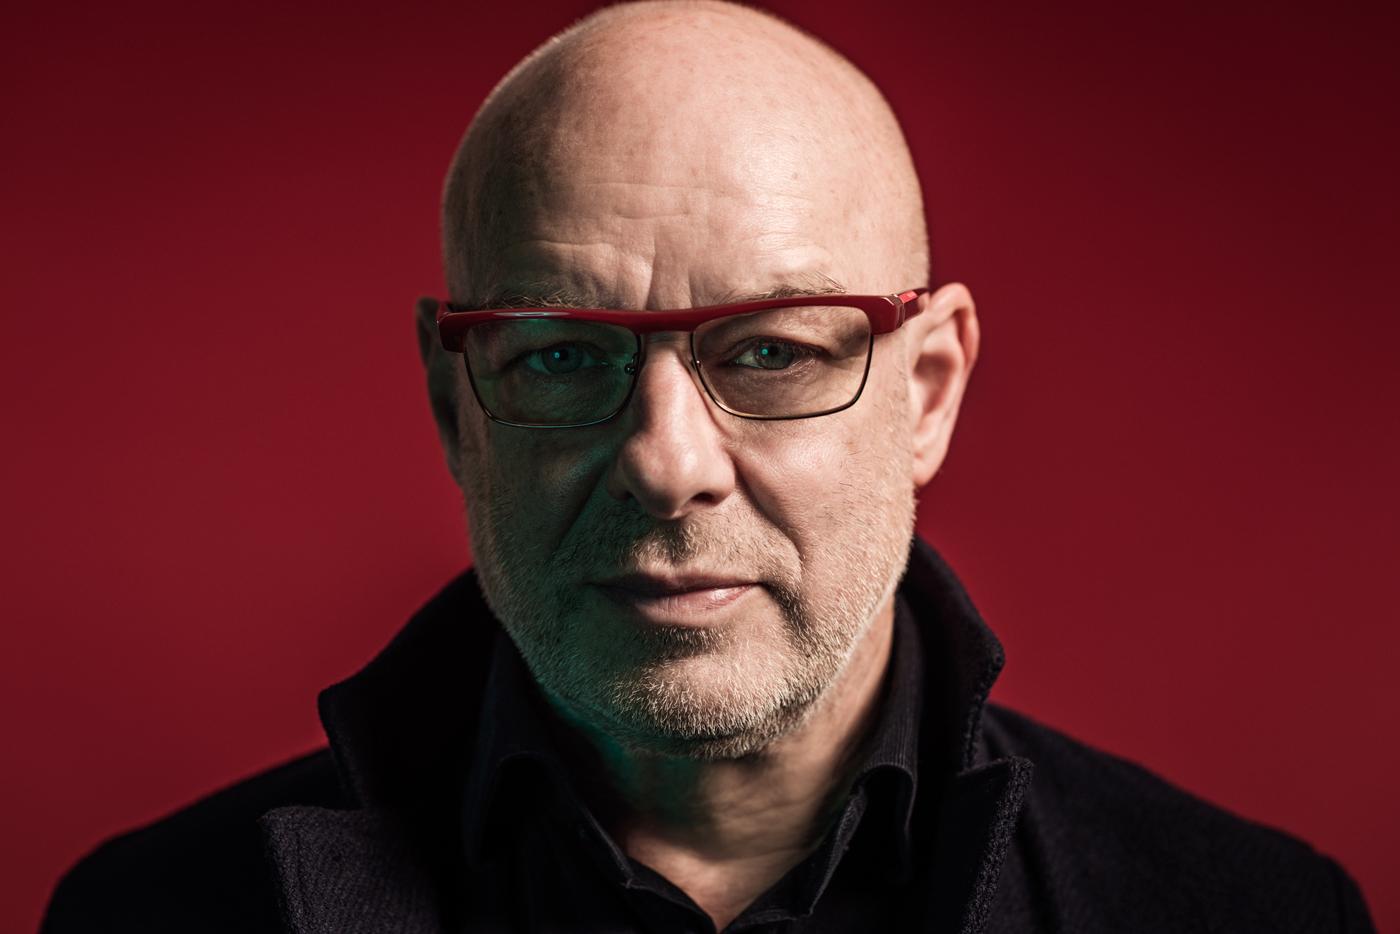 Brian Eno - Music Artist, Composer, Producer